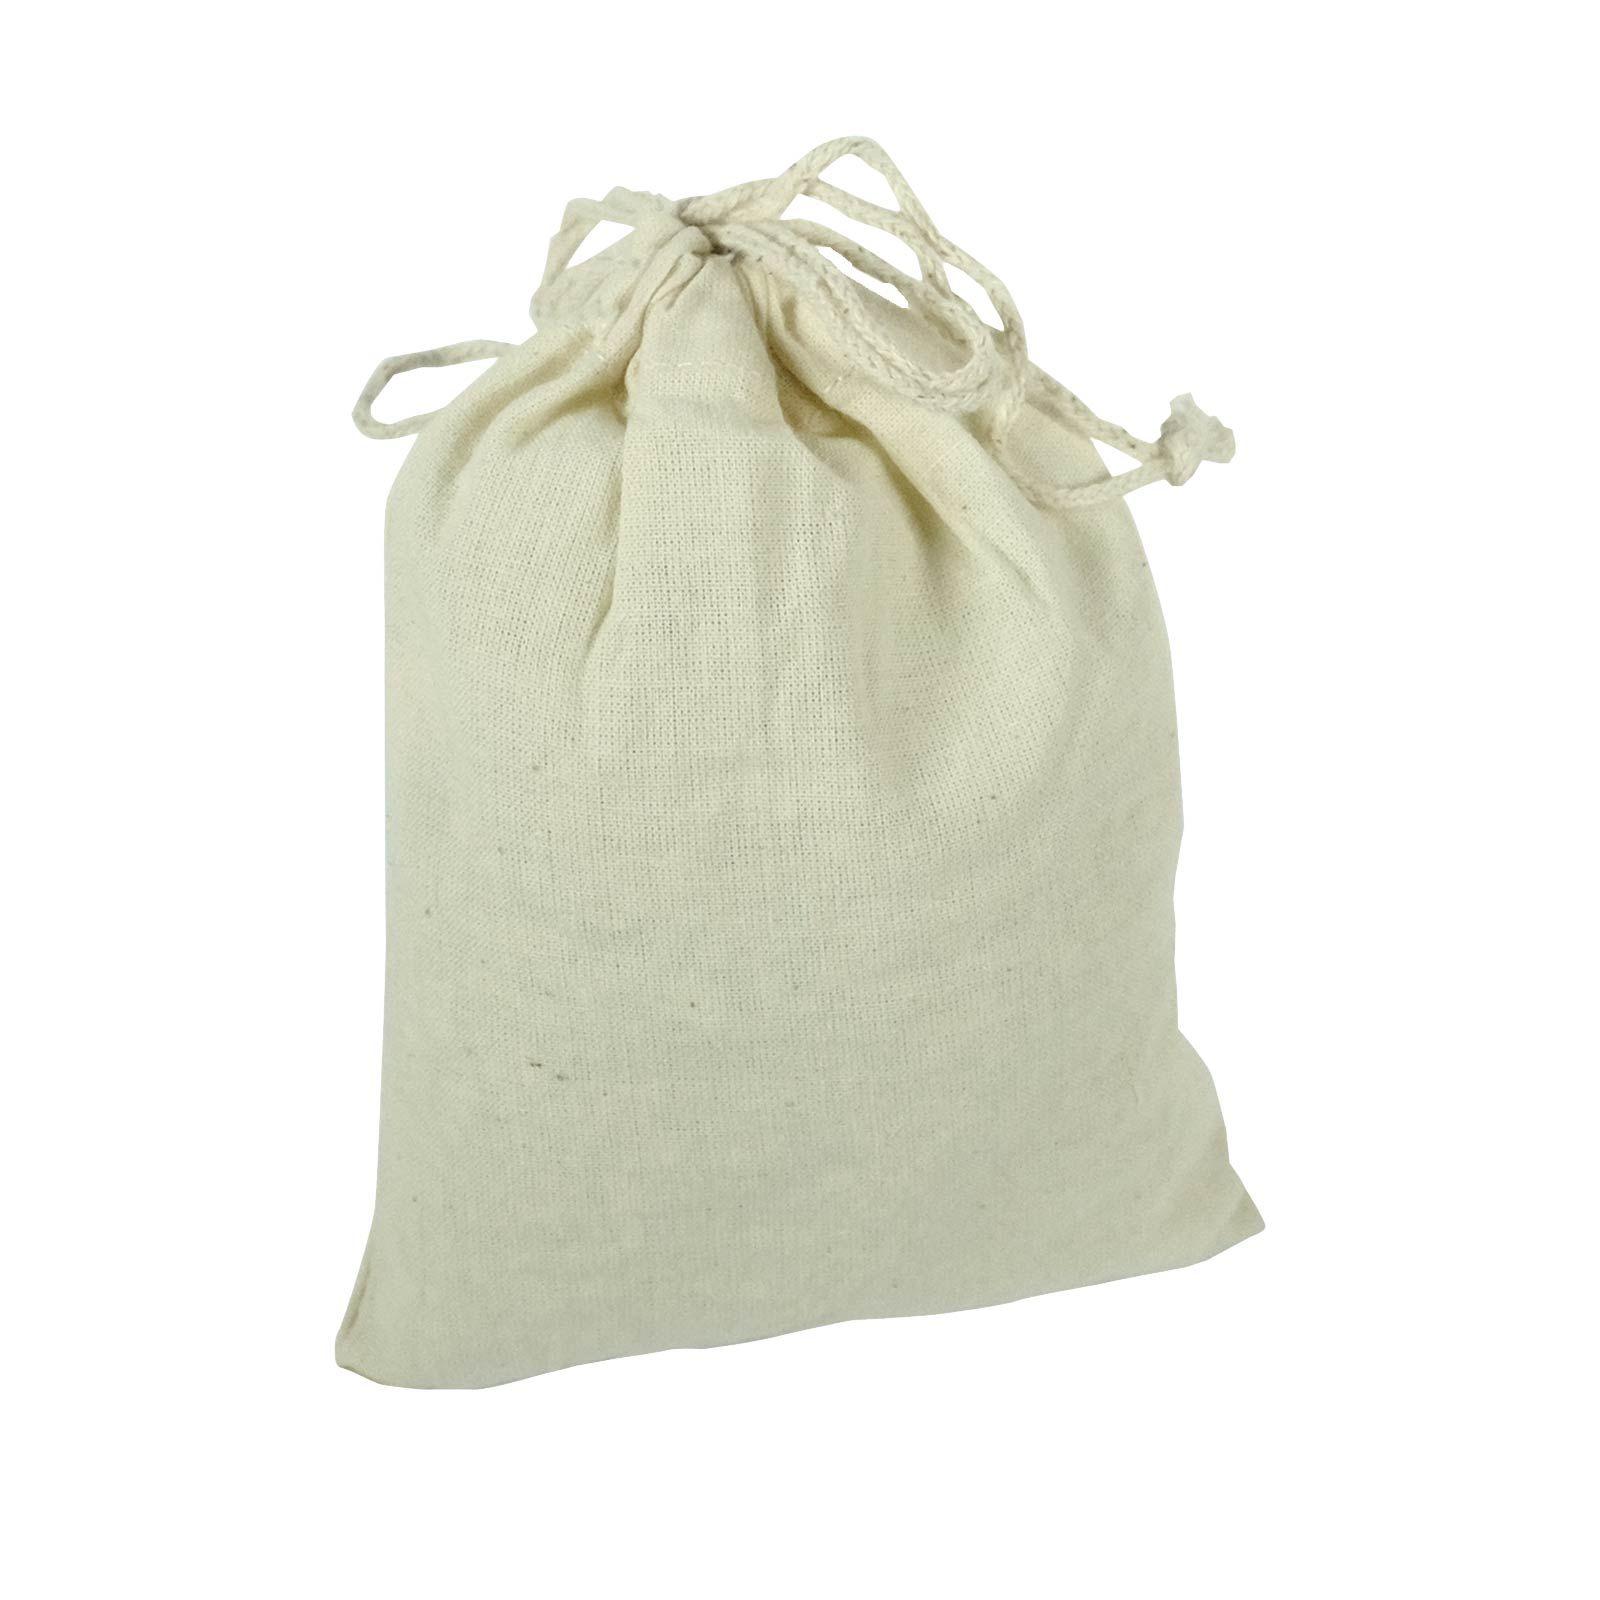 Zeolith Geruchsabsorber: Geruch entfernen & neutralisieren ...